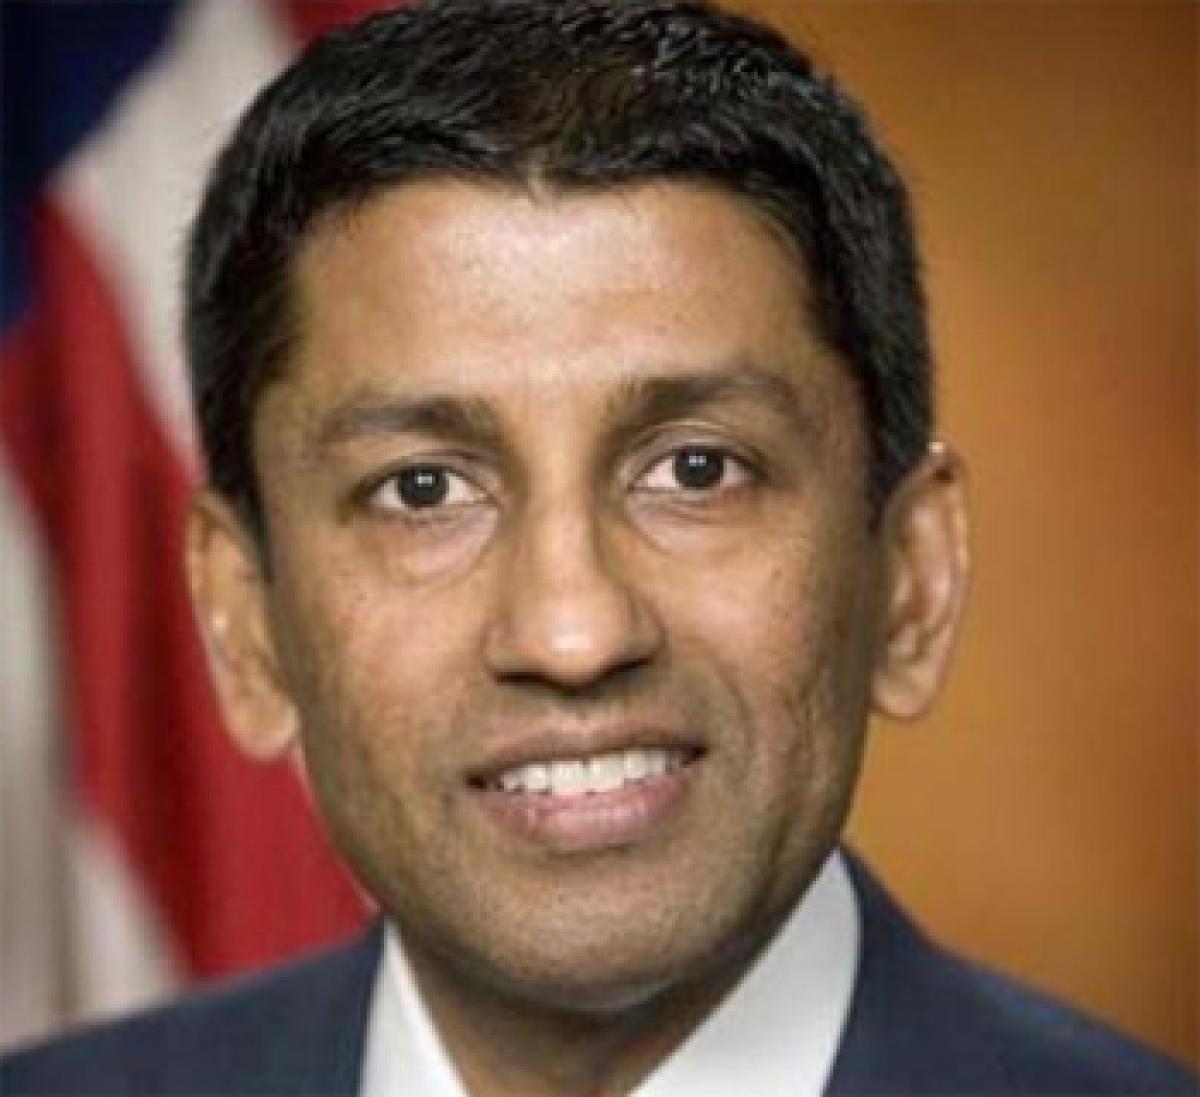 Will Obama nominate Tamil Nadu man as US' next Supreme Court Judge?